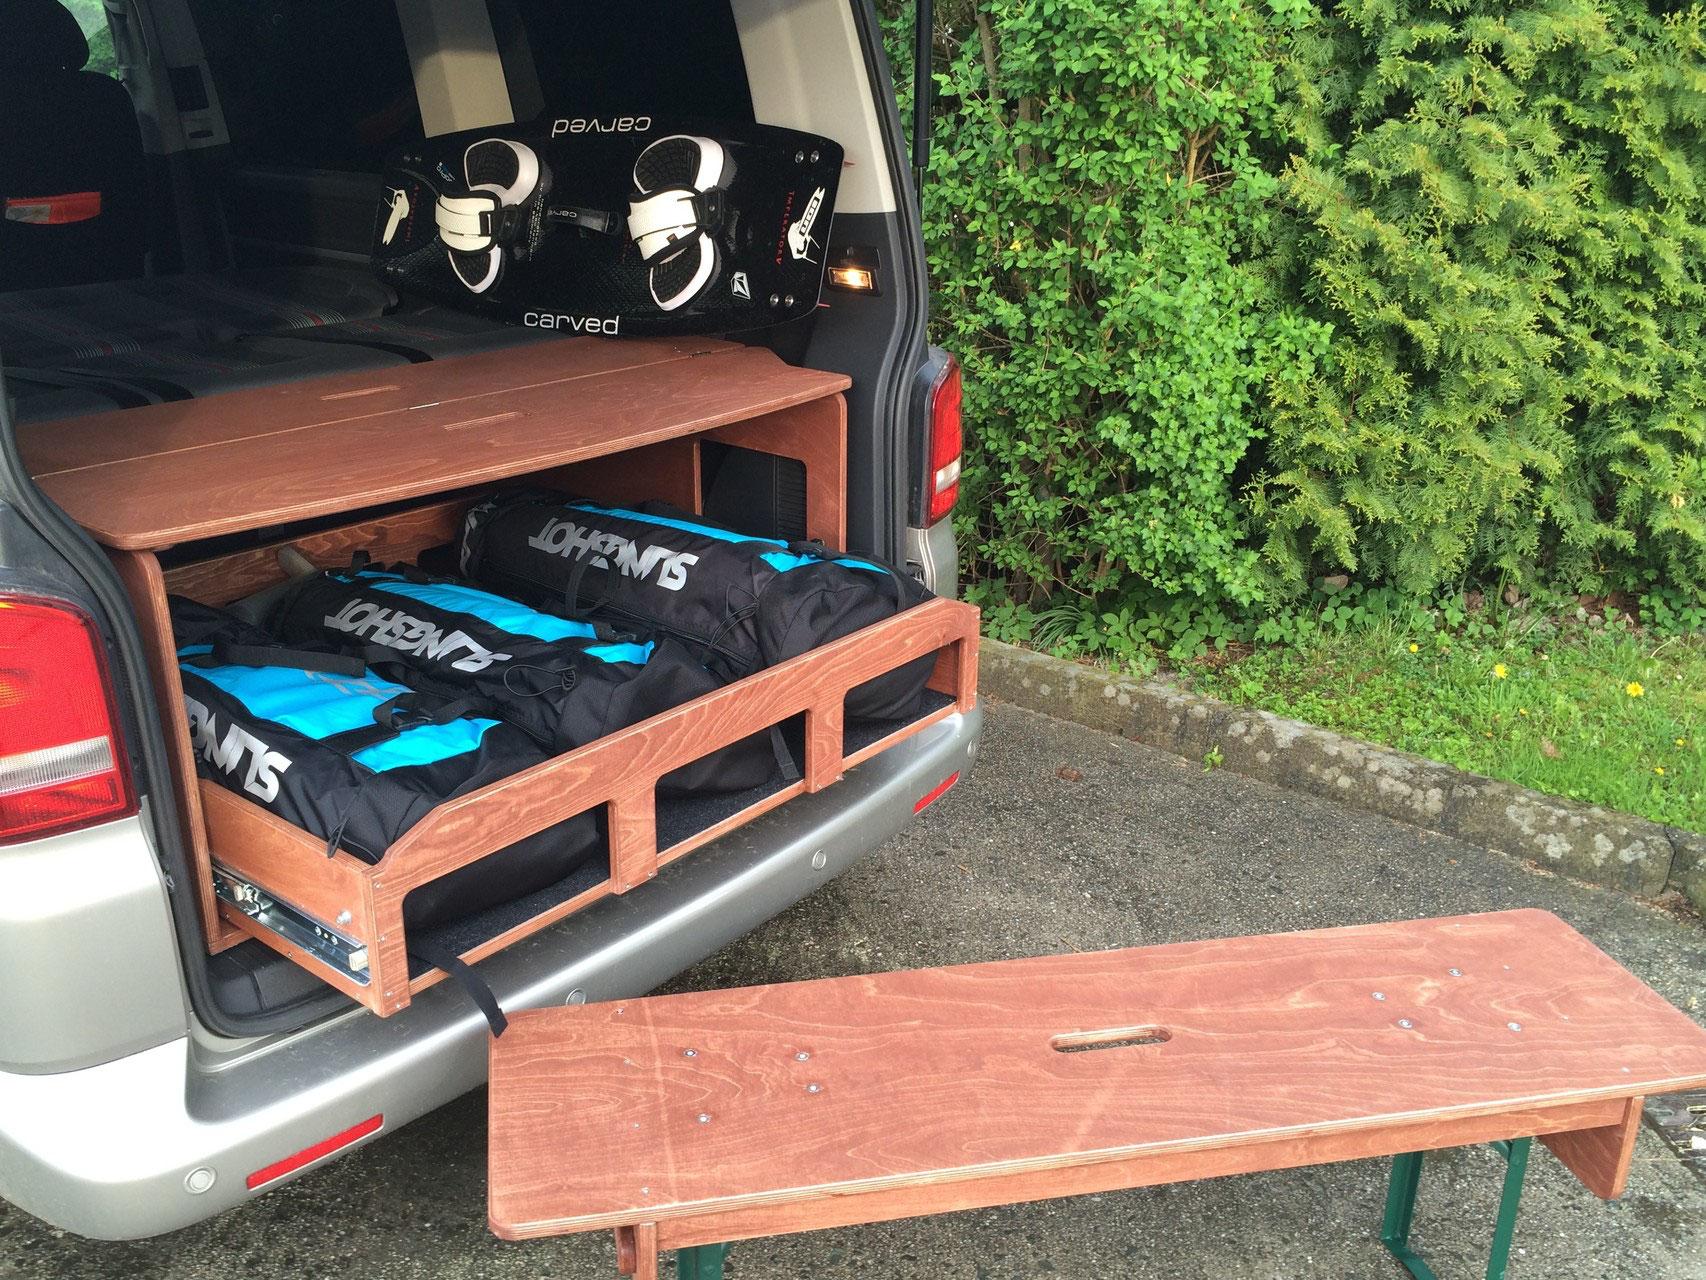 galerie travel sleep box. Black Bedroom Furniture Sets. Home Design Ideas